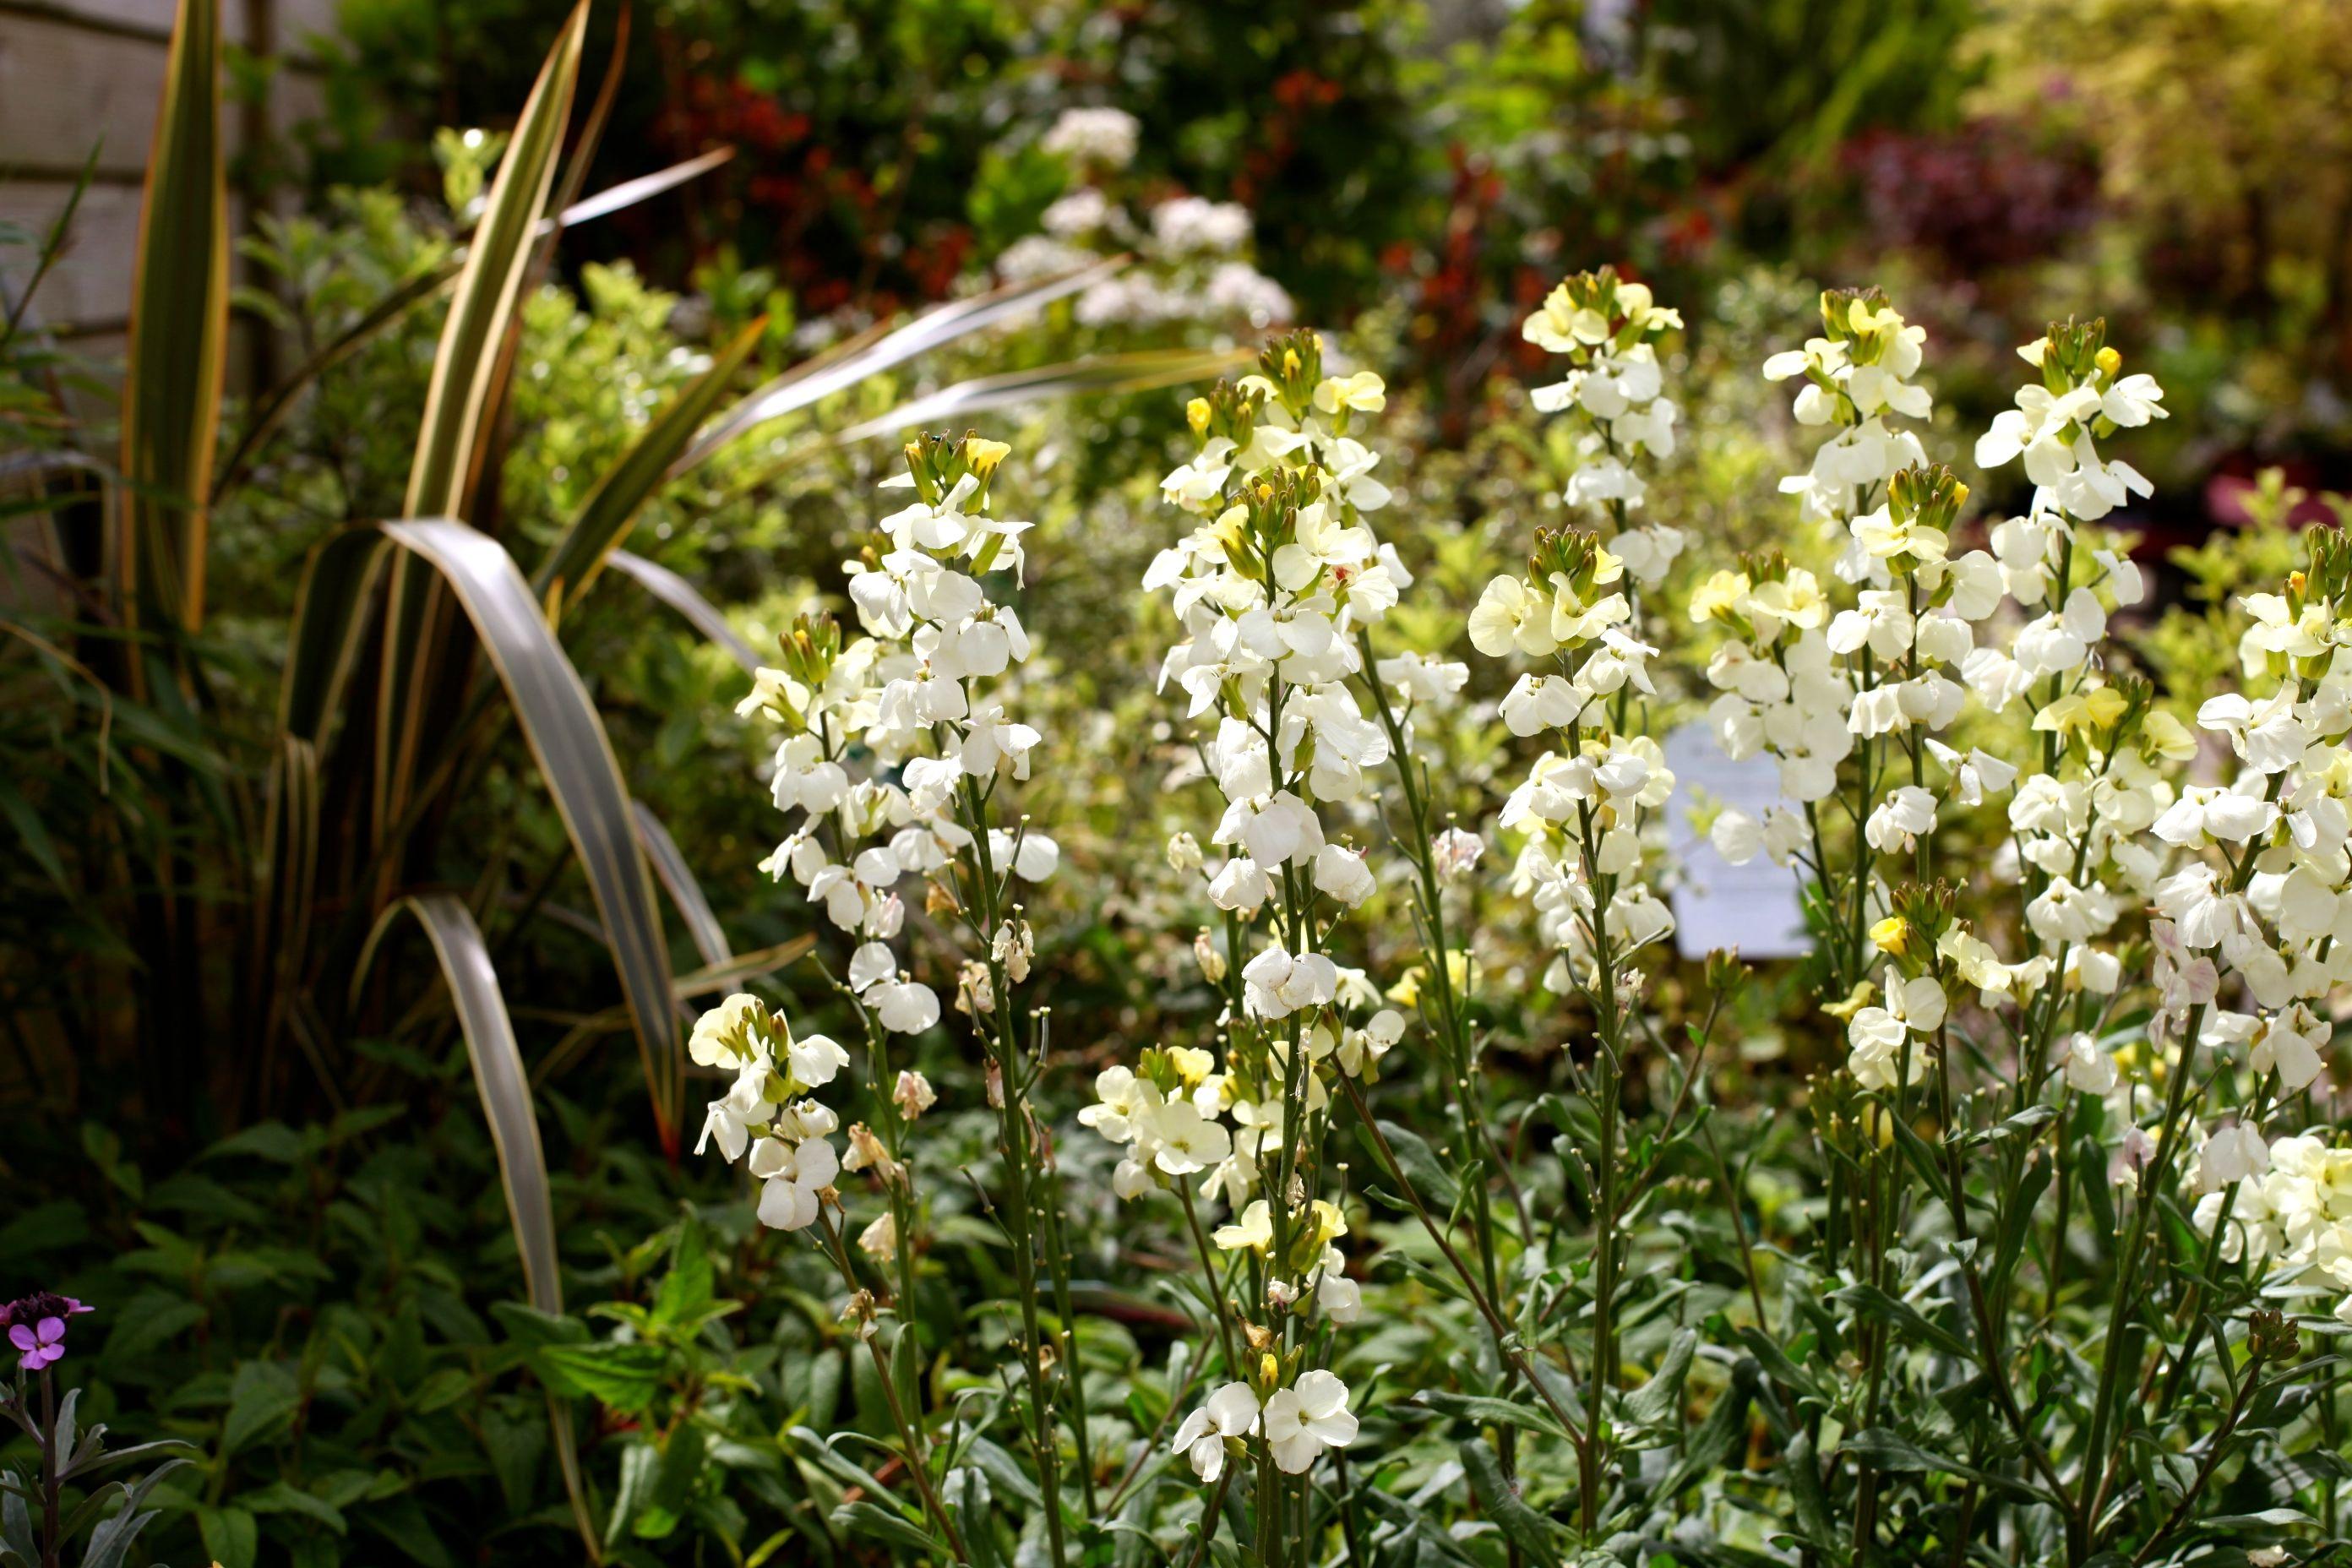 Erysimum Rysi Moon A Perennial Wallflower With Very Fragrant